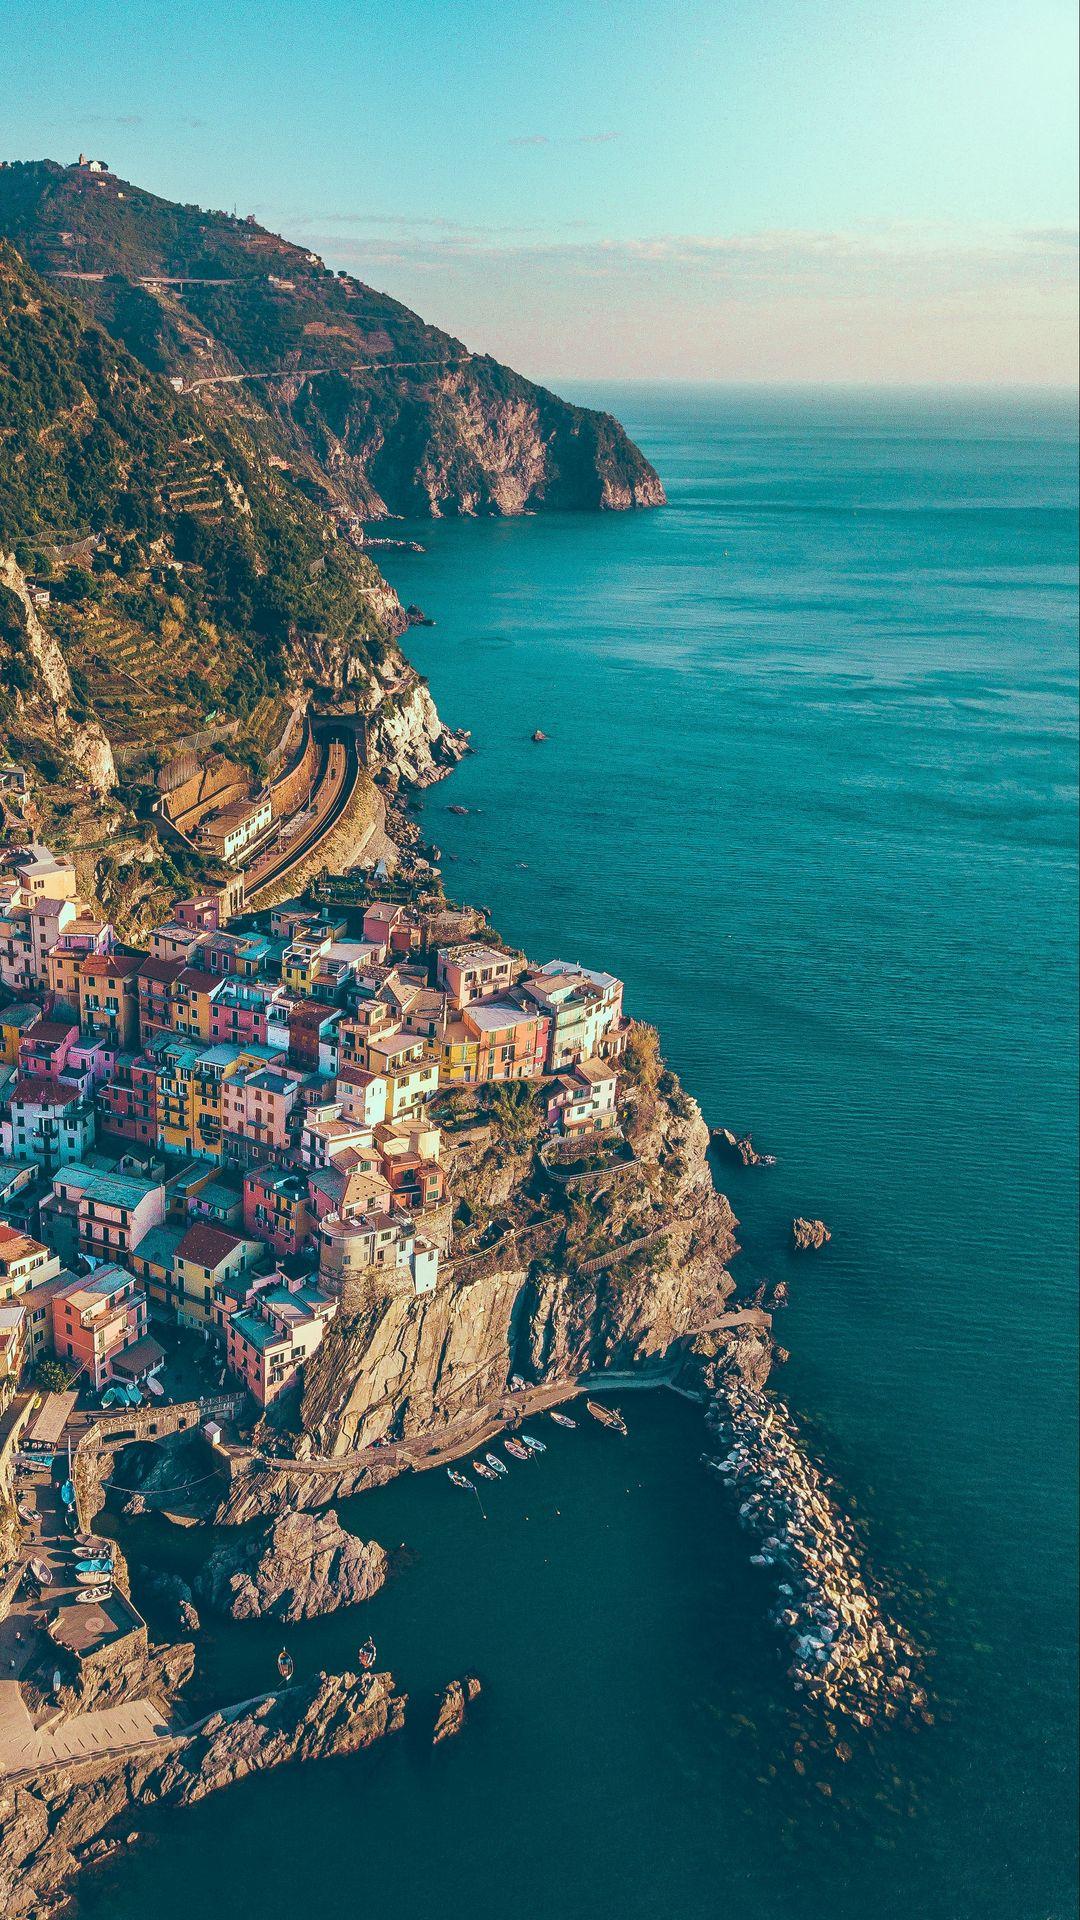 1080x1920 Wallpaper city, rocks, mountains, sea, manarola, italy